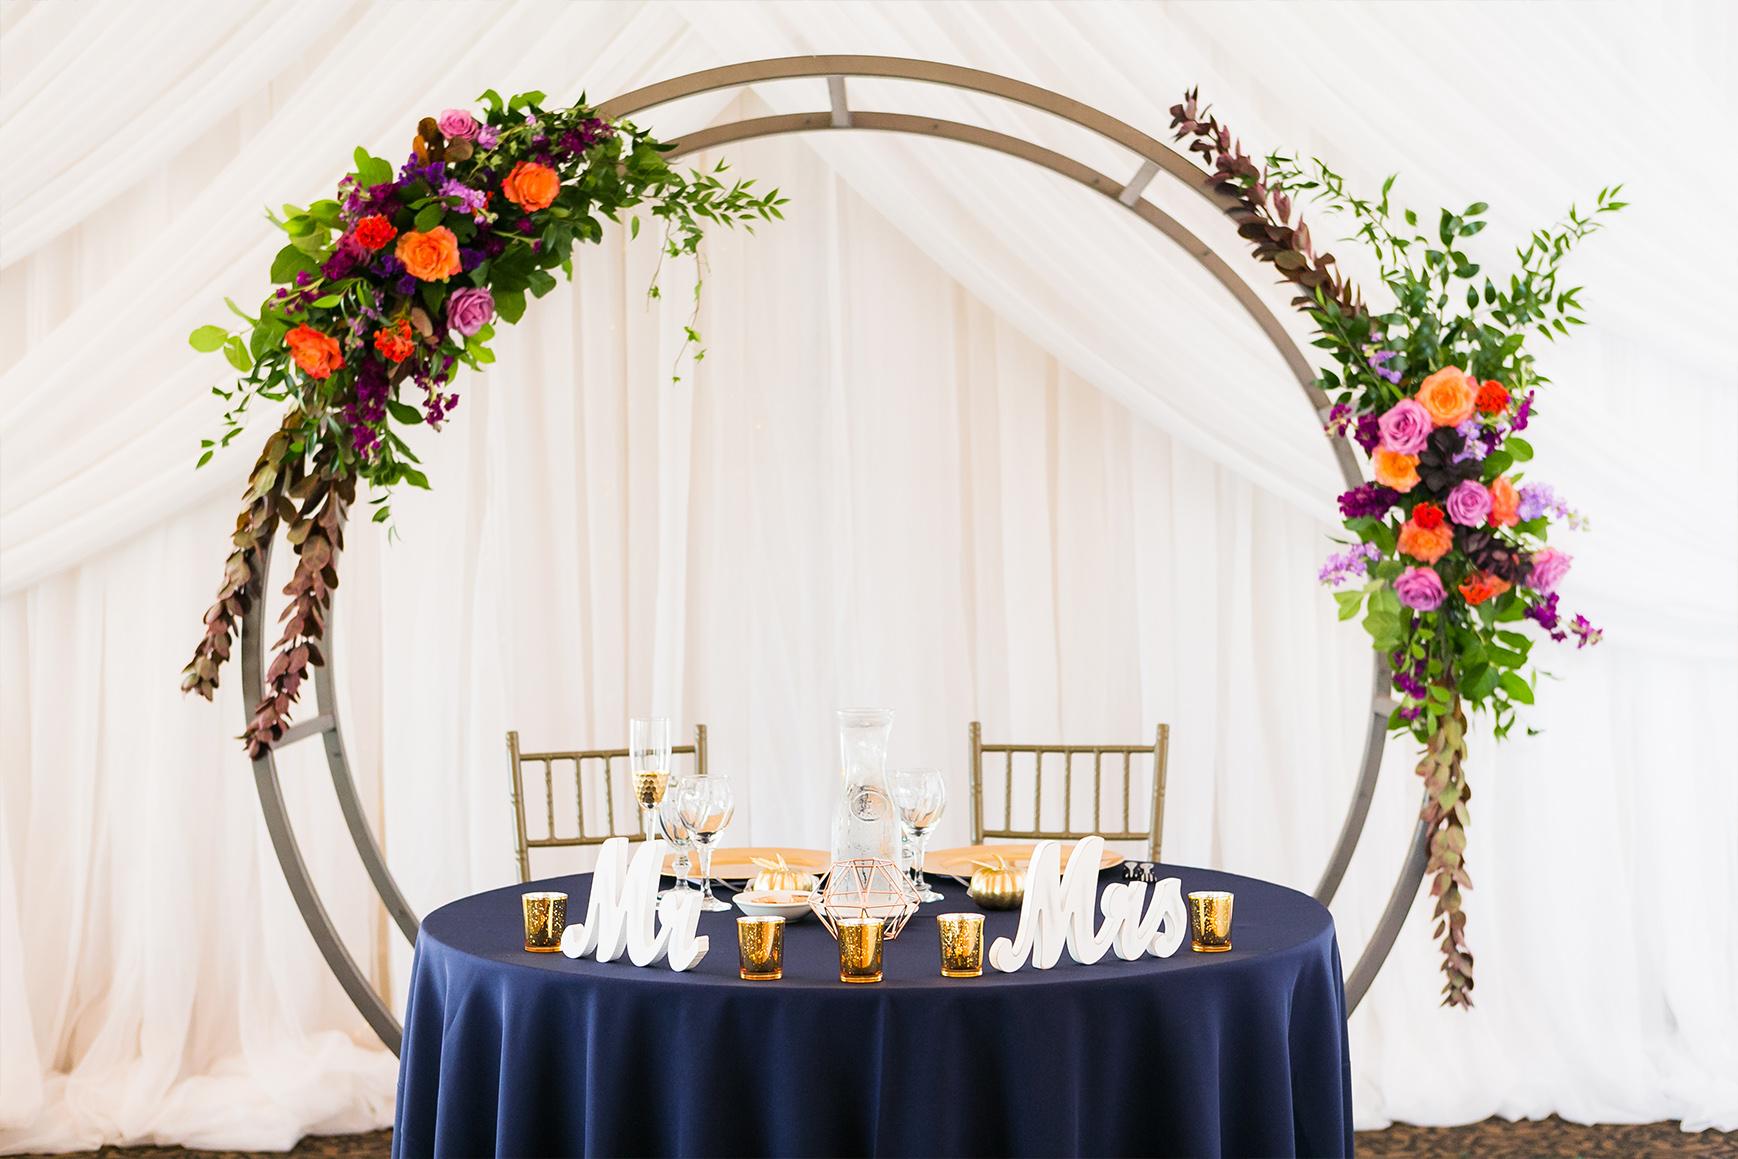 Stunning wedding photos - San Clemente - San Clemente, California - Orange County - Wedgewood Weddings